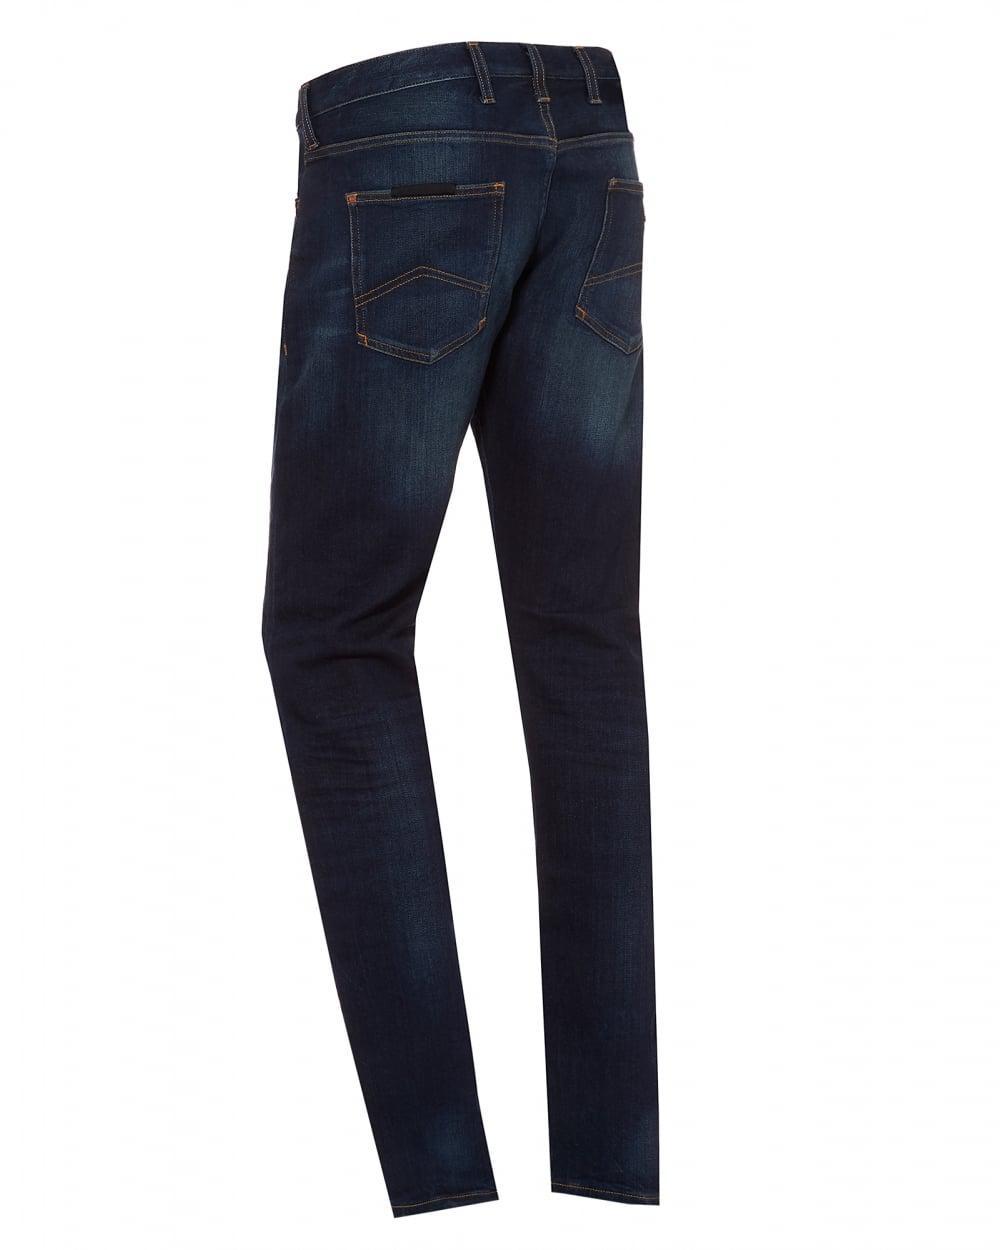 2e950c05269 Emporio Armani J10 Extra Slim Fit Jeans